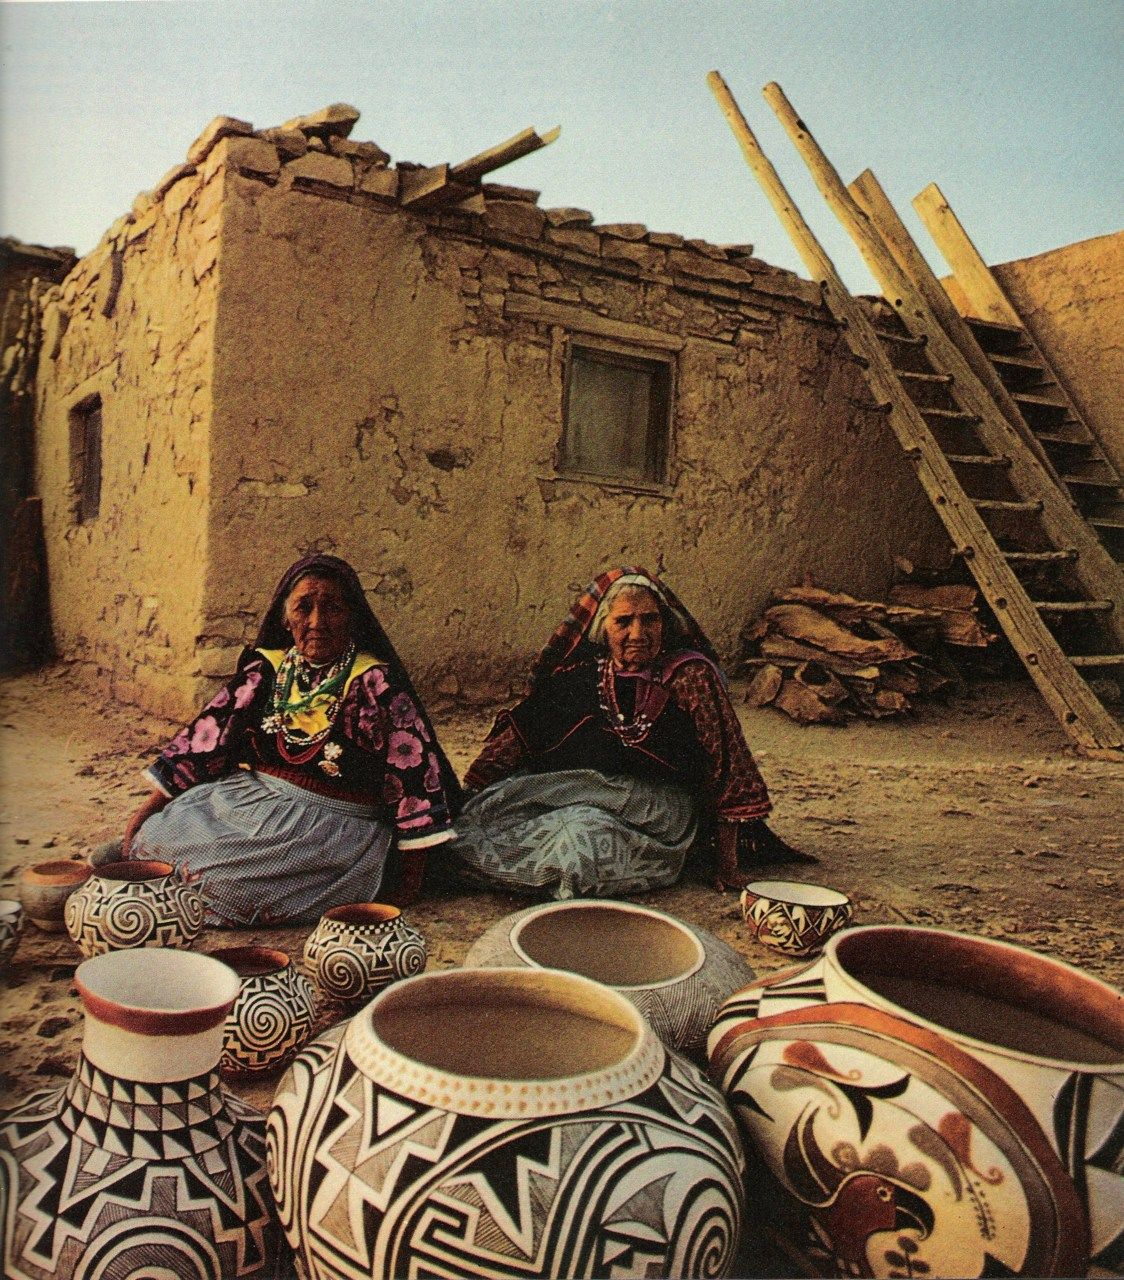 Native American Healing Herbs Plants: Acoma Pueblo, Cibola County, New Mexico, USA